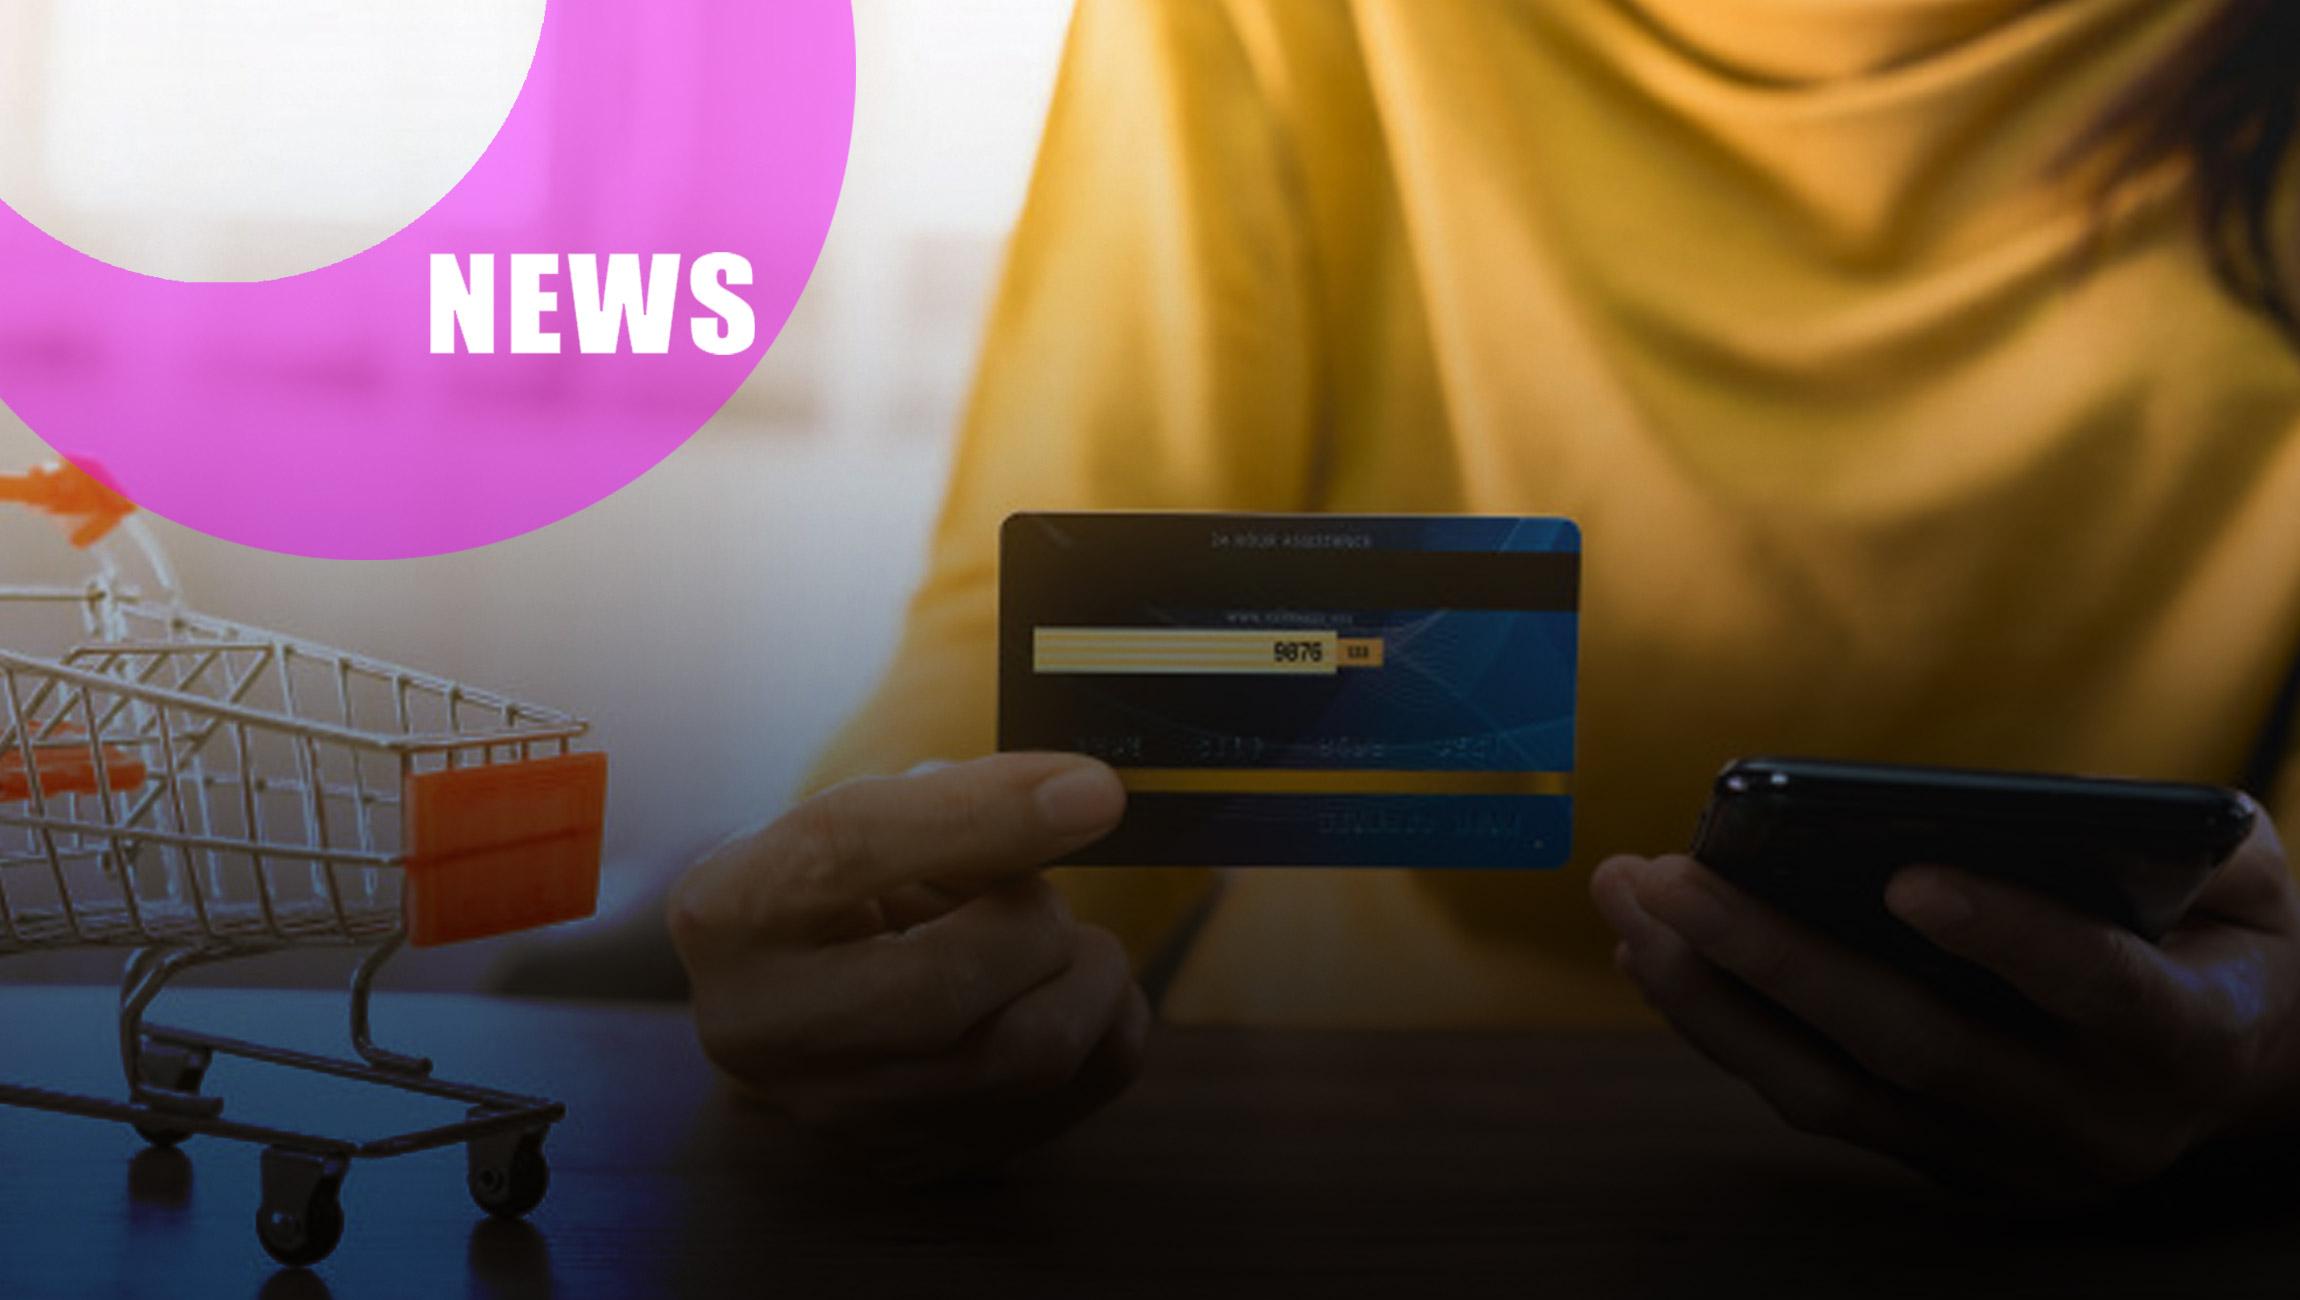 ShipStation, Alibaba.com Launch Integration for B2B e-Commerce Merchants